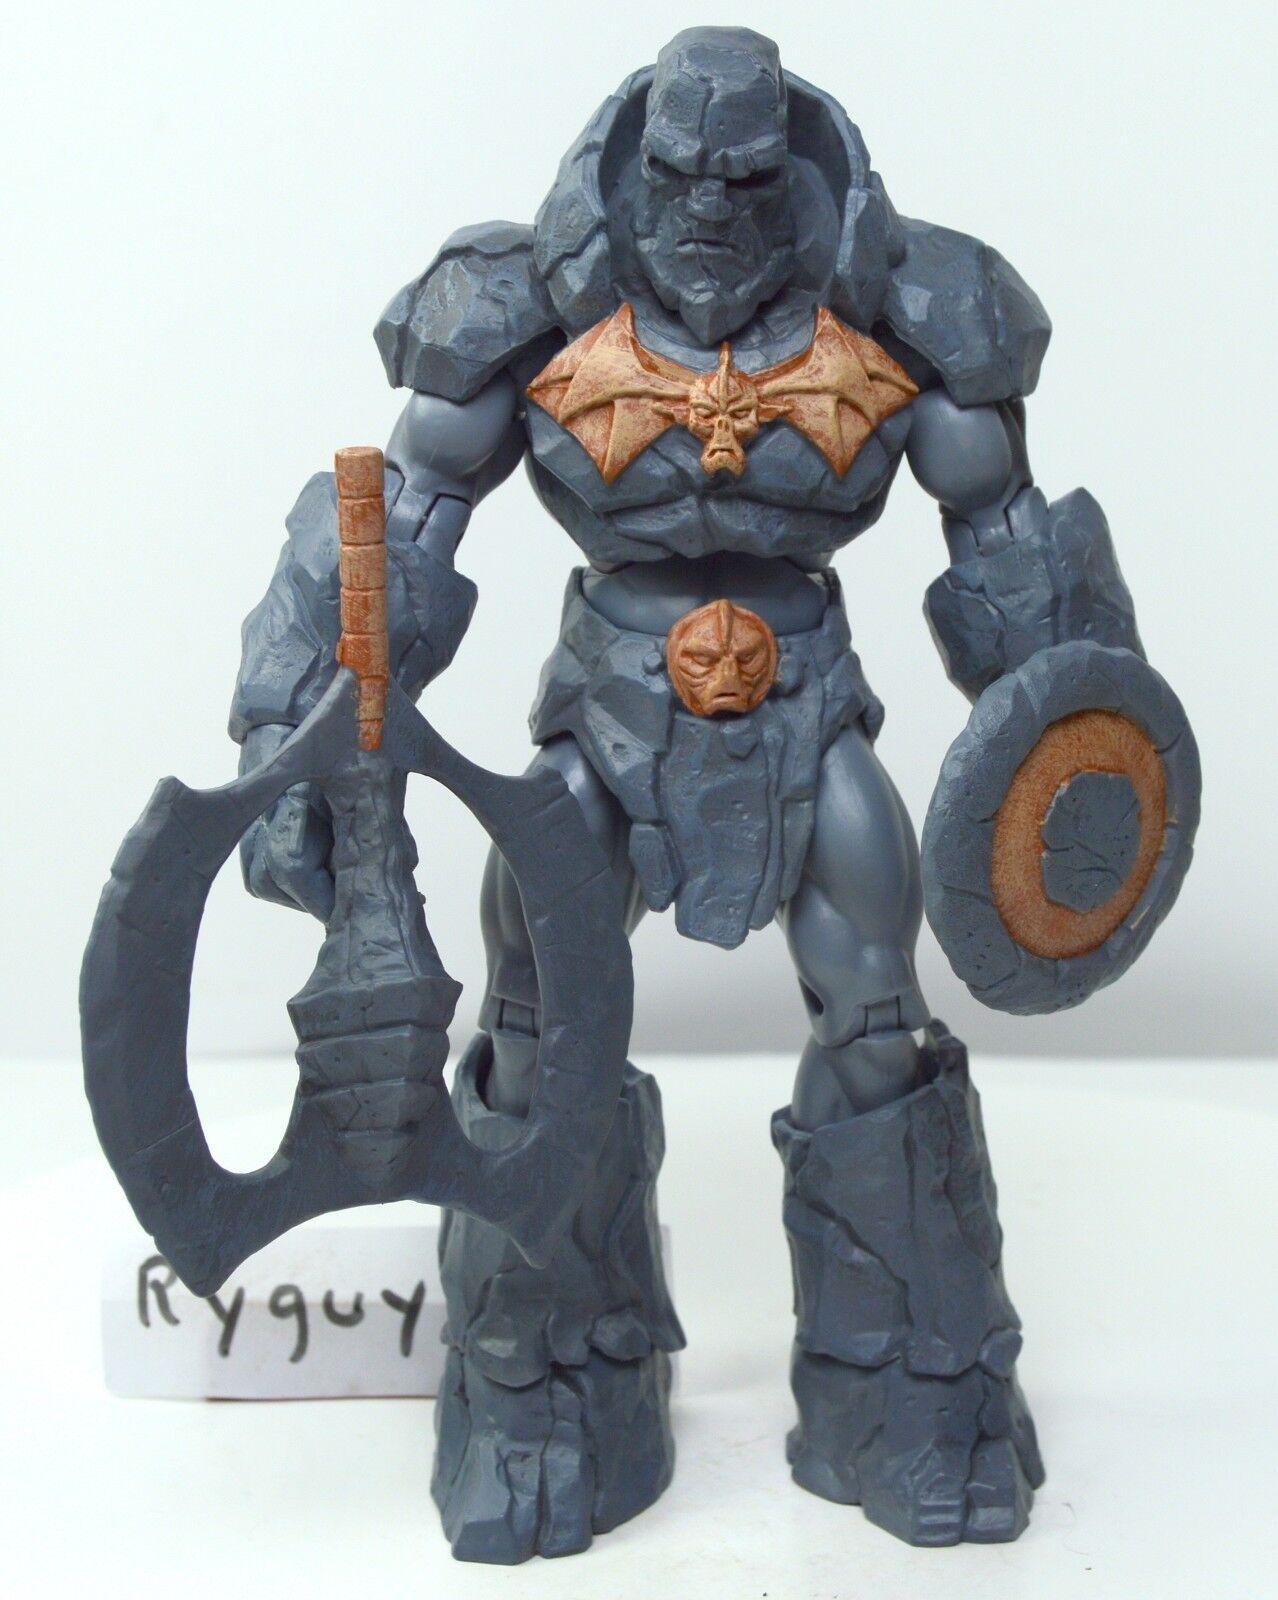 MOTUC, Callix, complete, figure, Masters of the Universe Classics He-Man